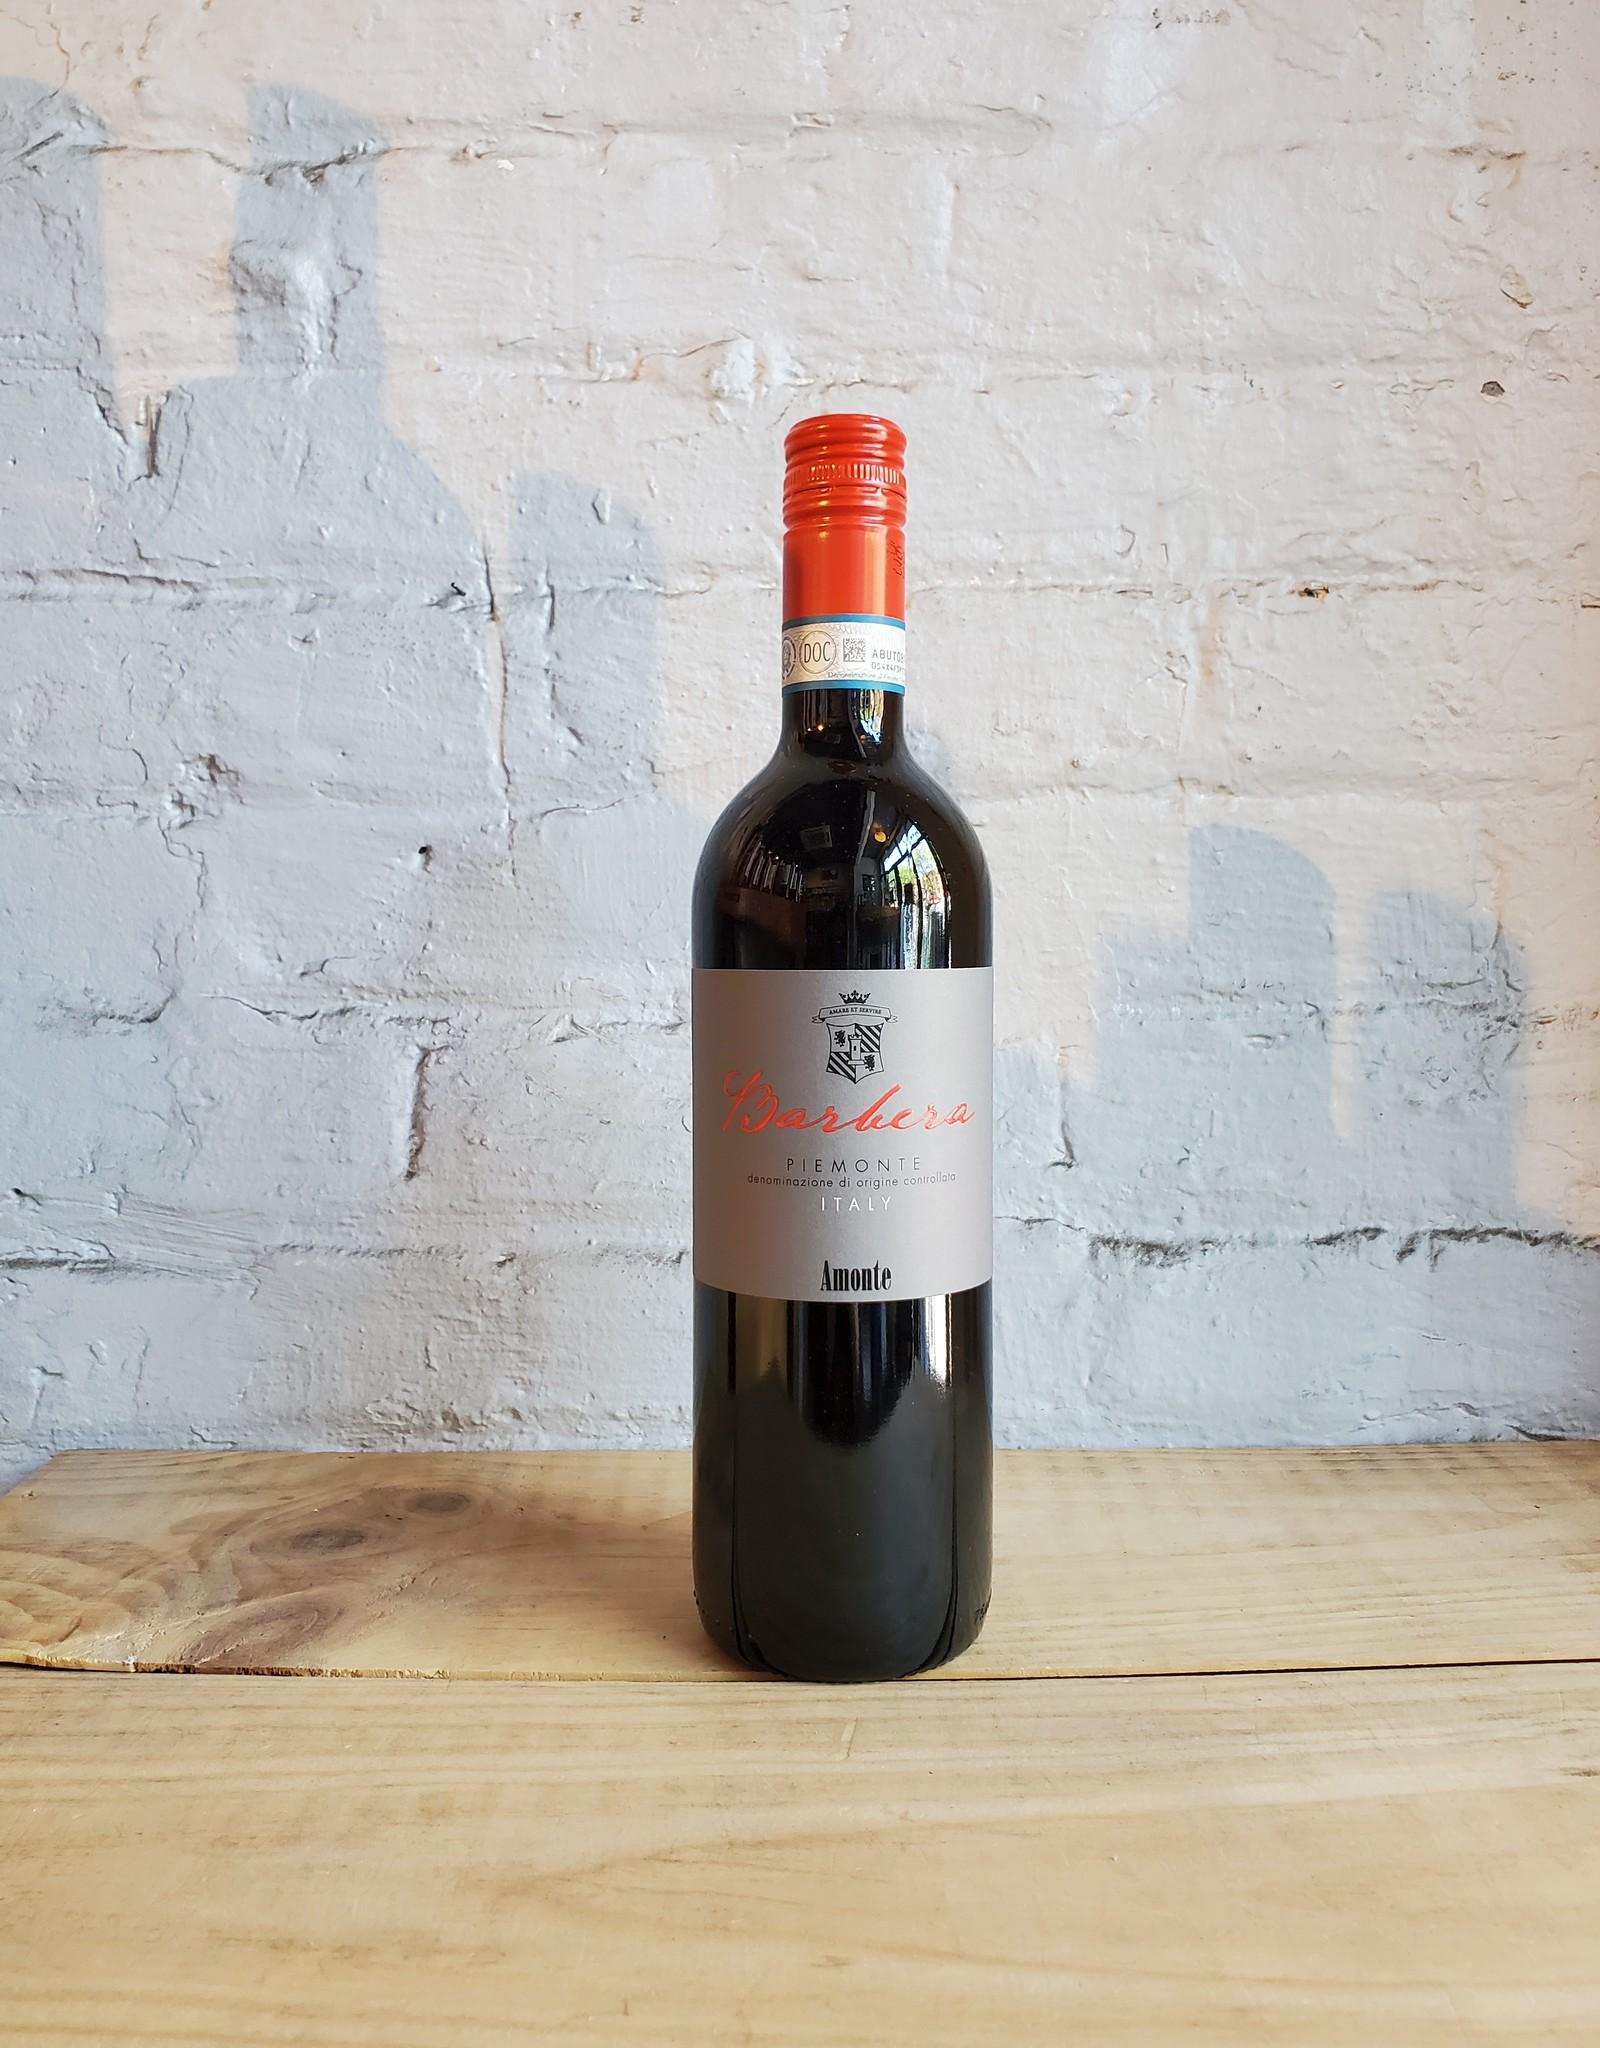 Wine 2019 Amonte Barbera - Piedmont, Italy (750ml)